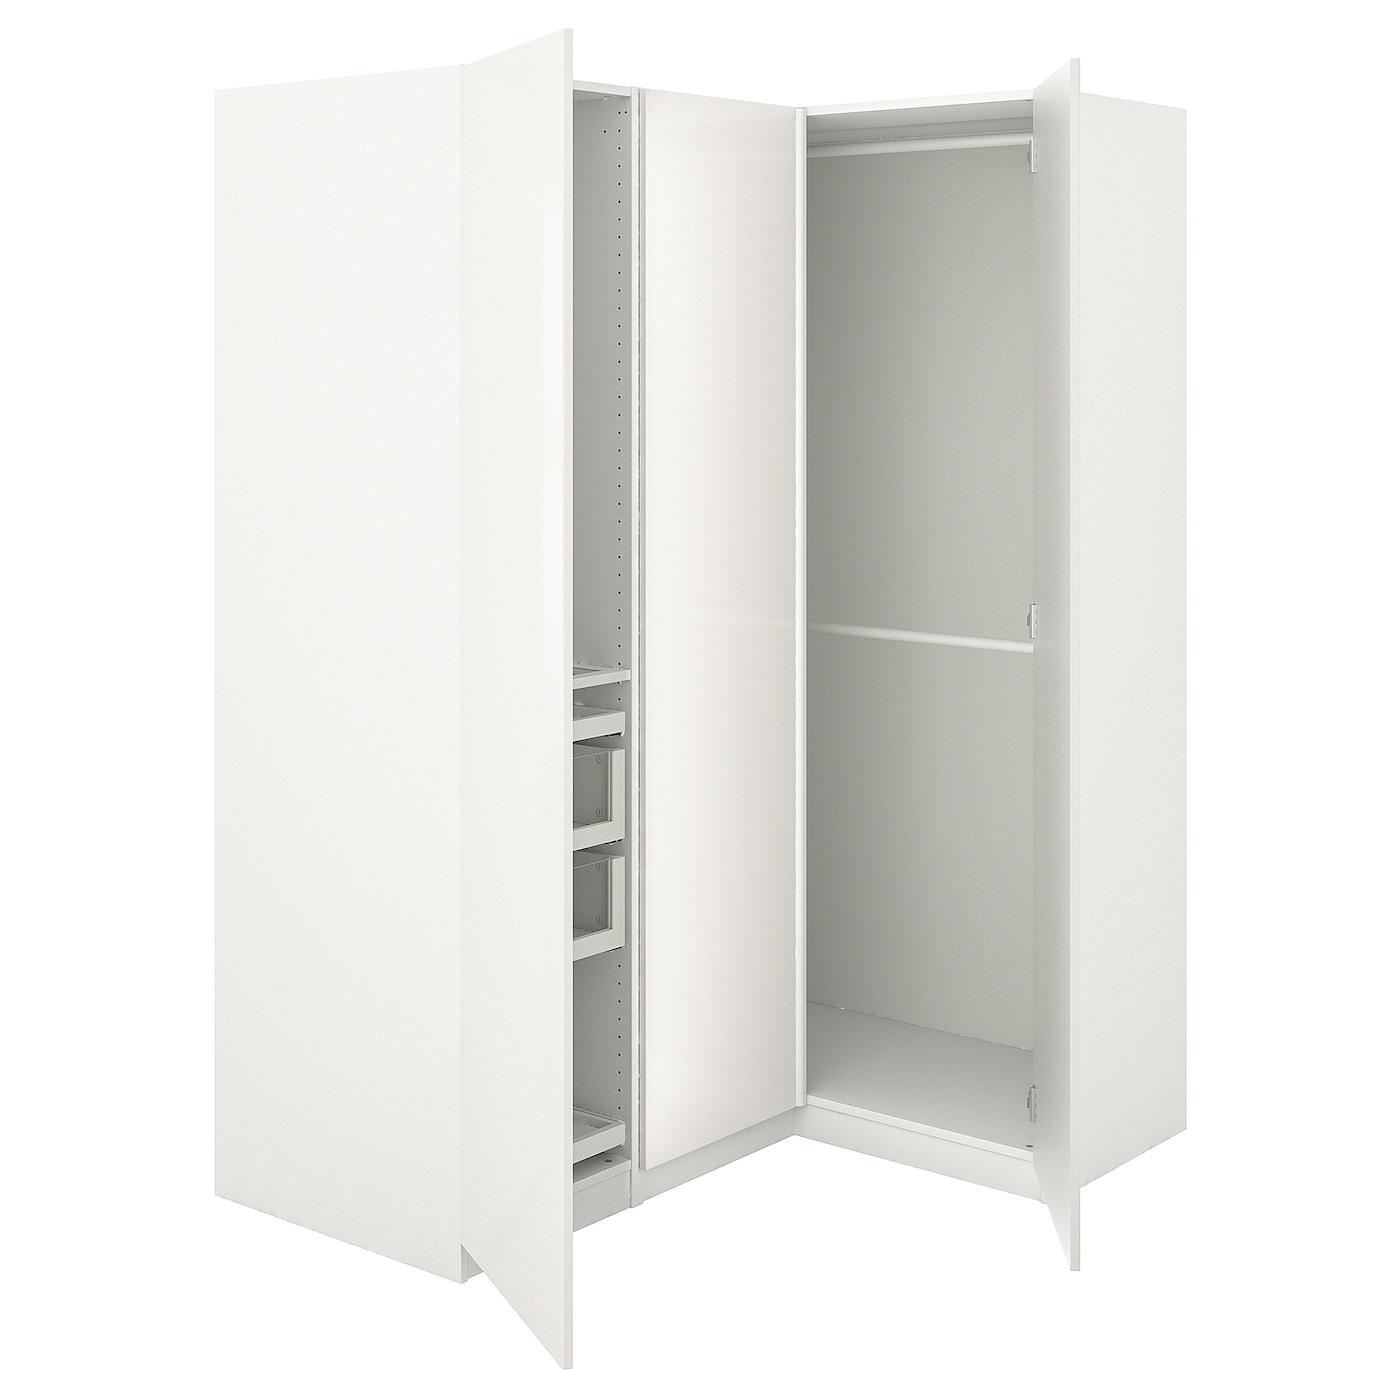 Buy Pax Corner Wardrobe White Fardal High Gloss White Online Ikea